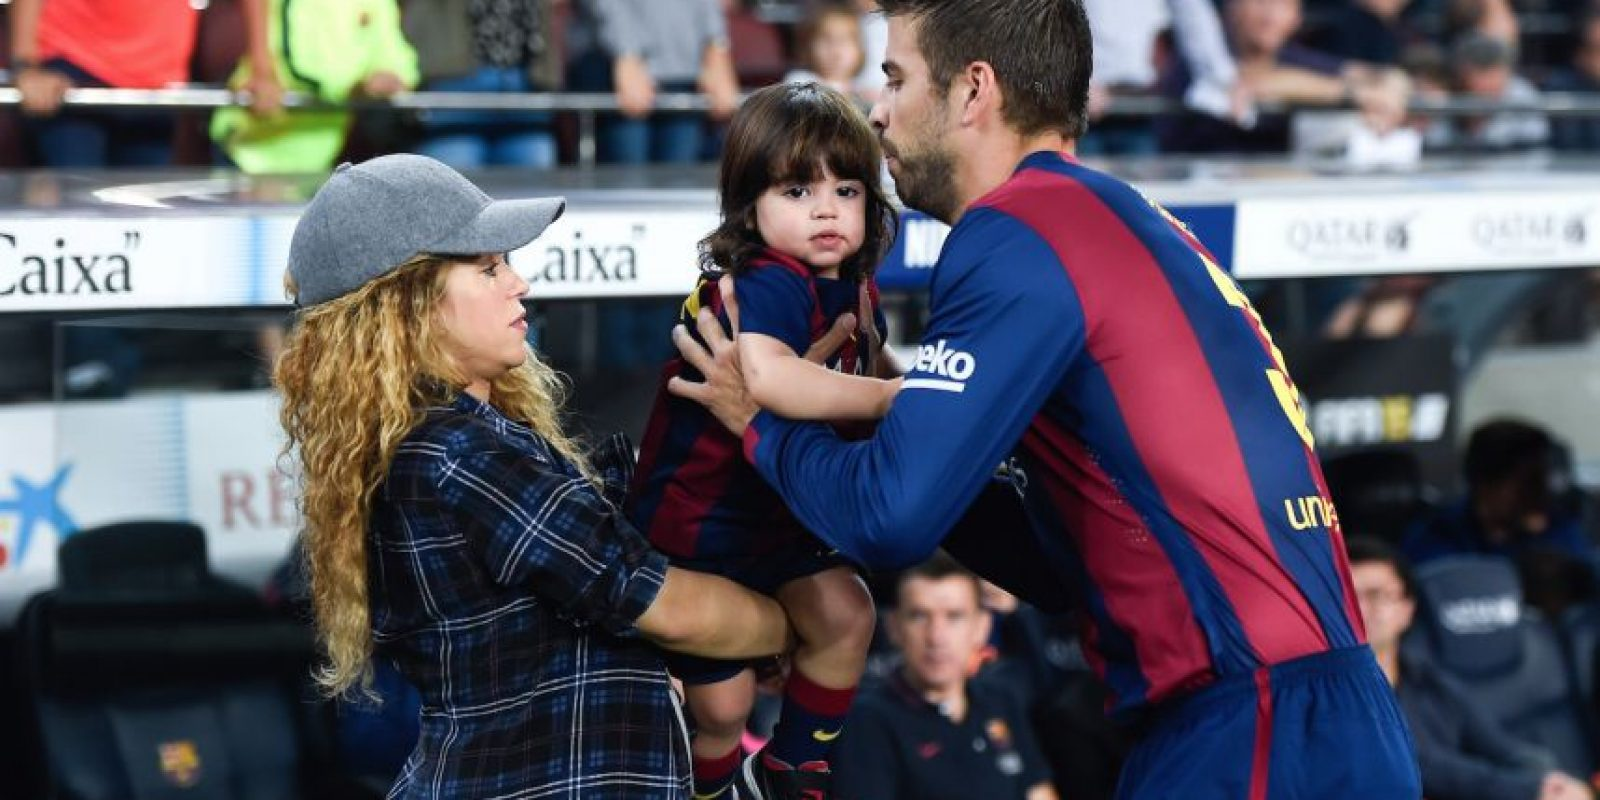 La cantante espera tener una niña Foto:Getty Images